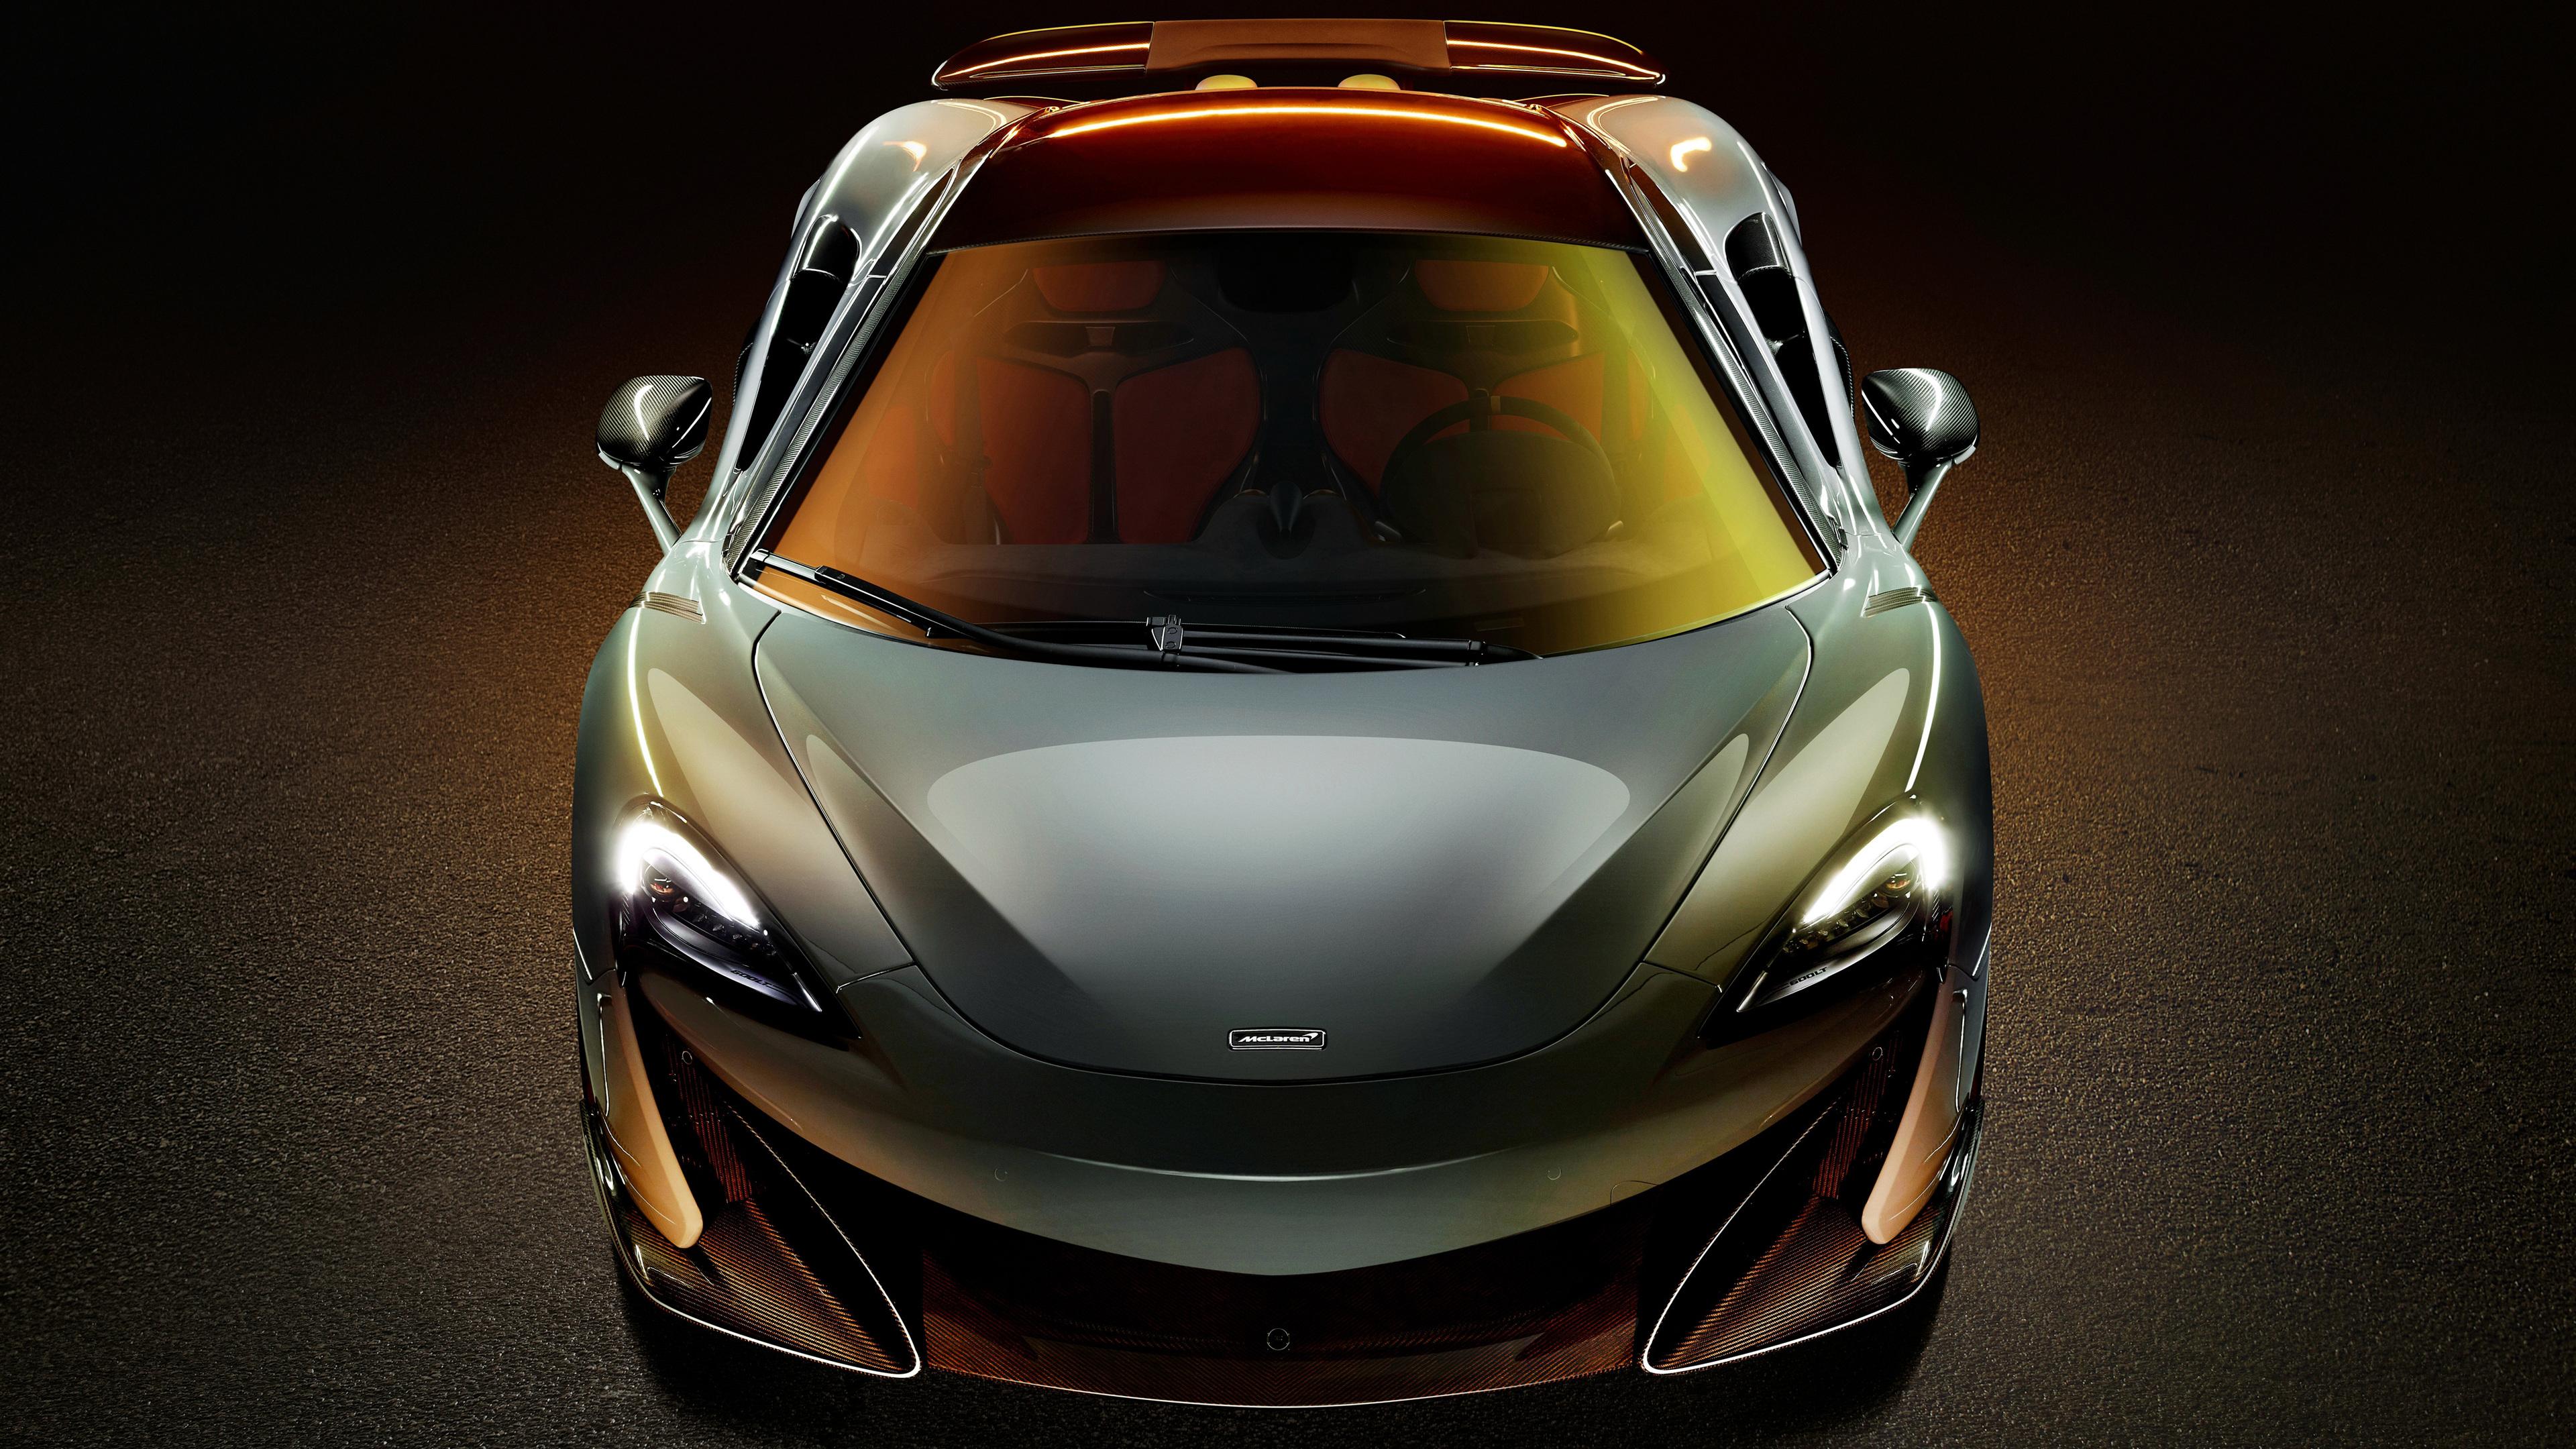 mclaren 600lt 2018 front 1539112067 - McLaren 600LT 2018 Front - mclaren wallpapers, mclaren 600lt wallpapers, hd-wallpapers, cars wallpapers, 4k-wallpapers, 2018 cars wallpapers